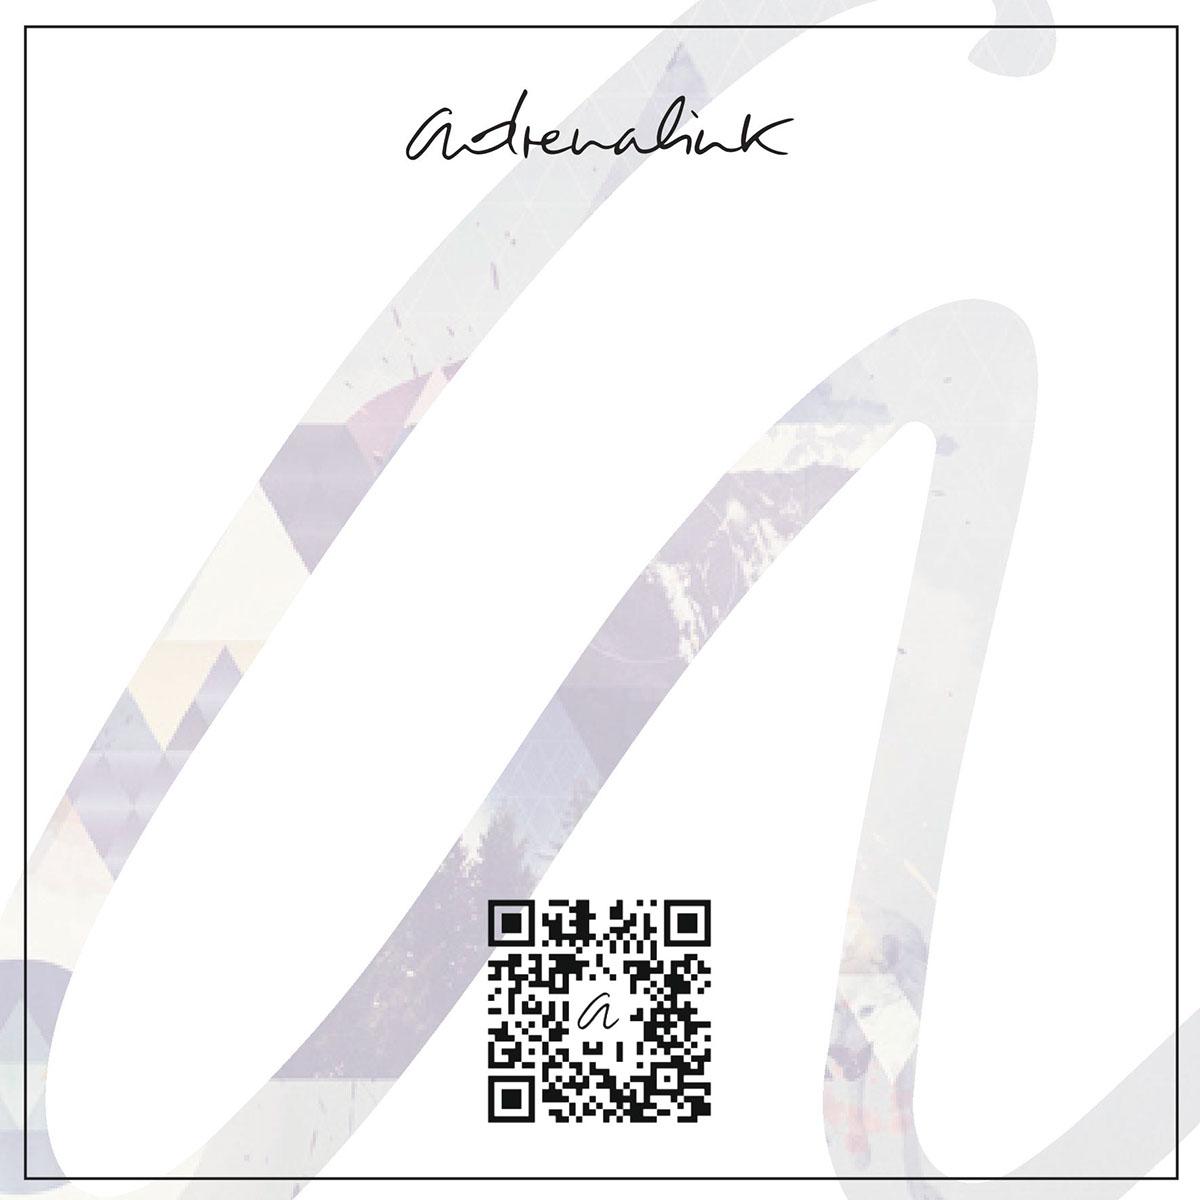 Adrenalink,André Theubet,Web International School,wis,carte de voeux,Voeux 2016